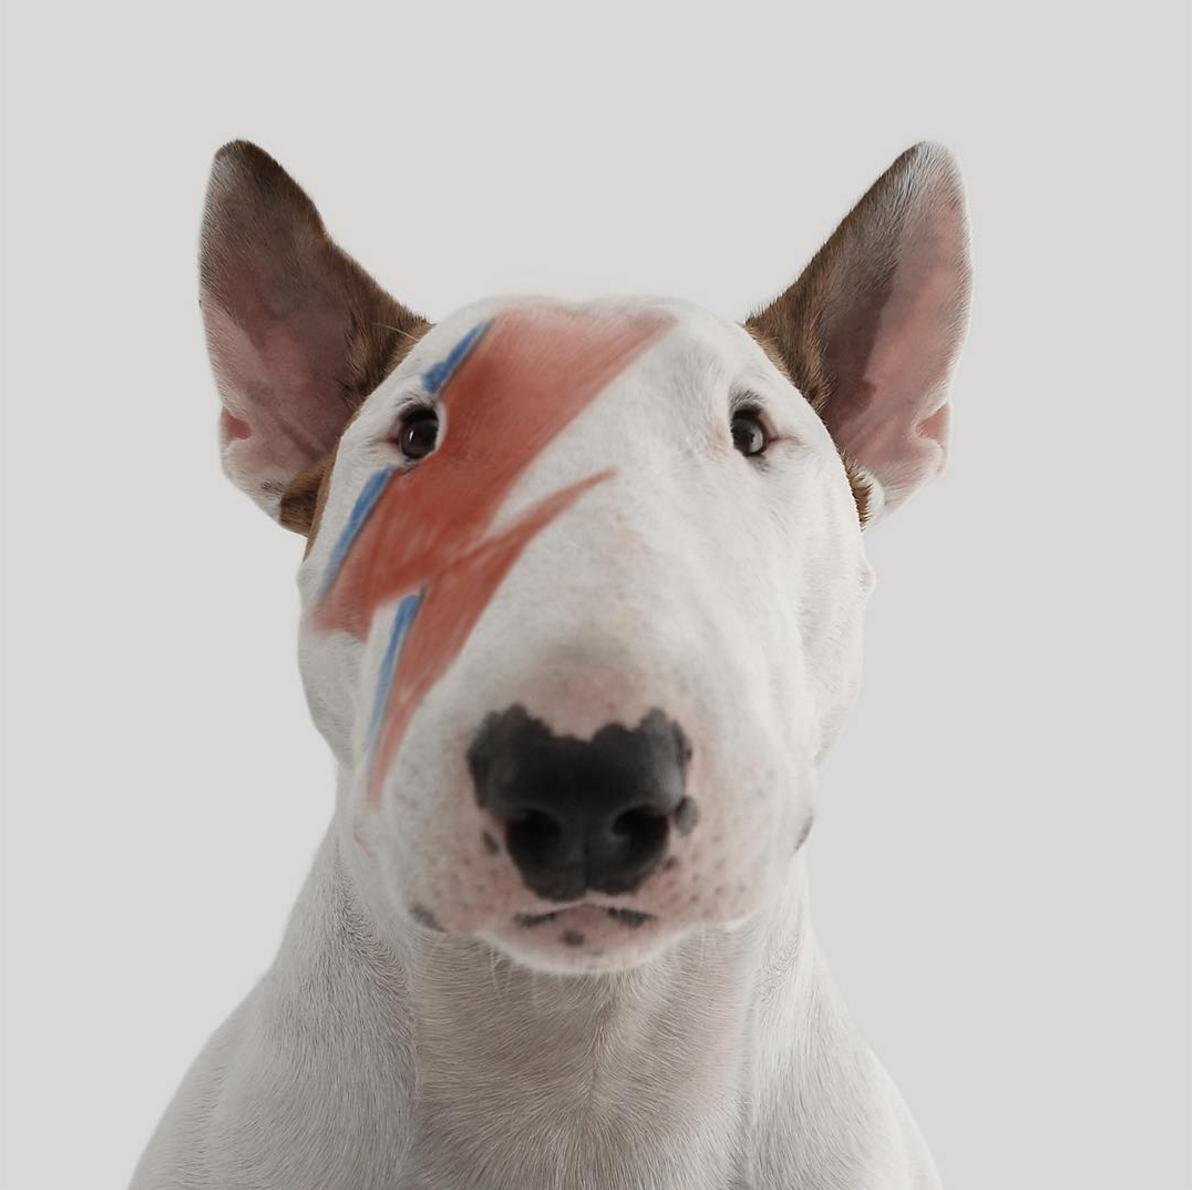 David Bowie,Ziggy Stardust, dog, purebred dog